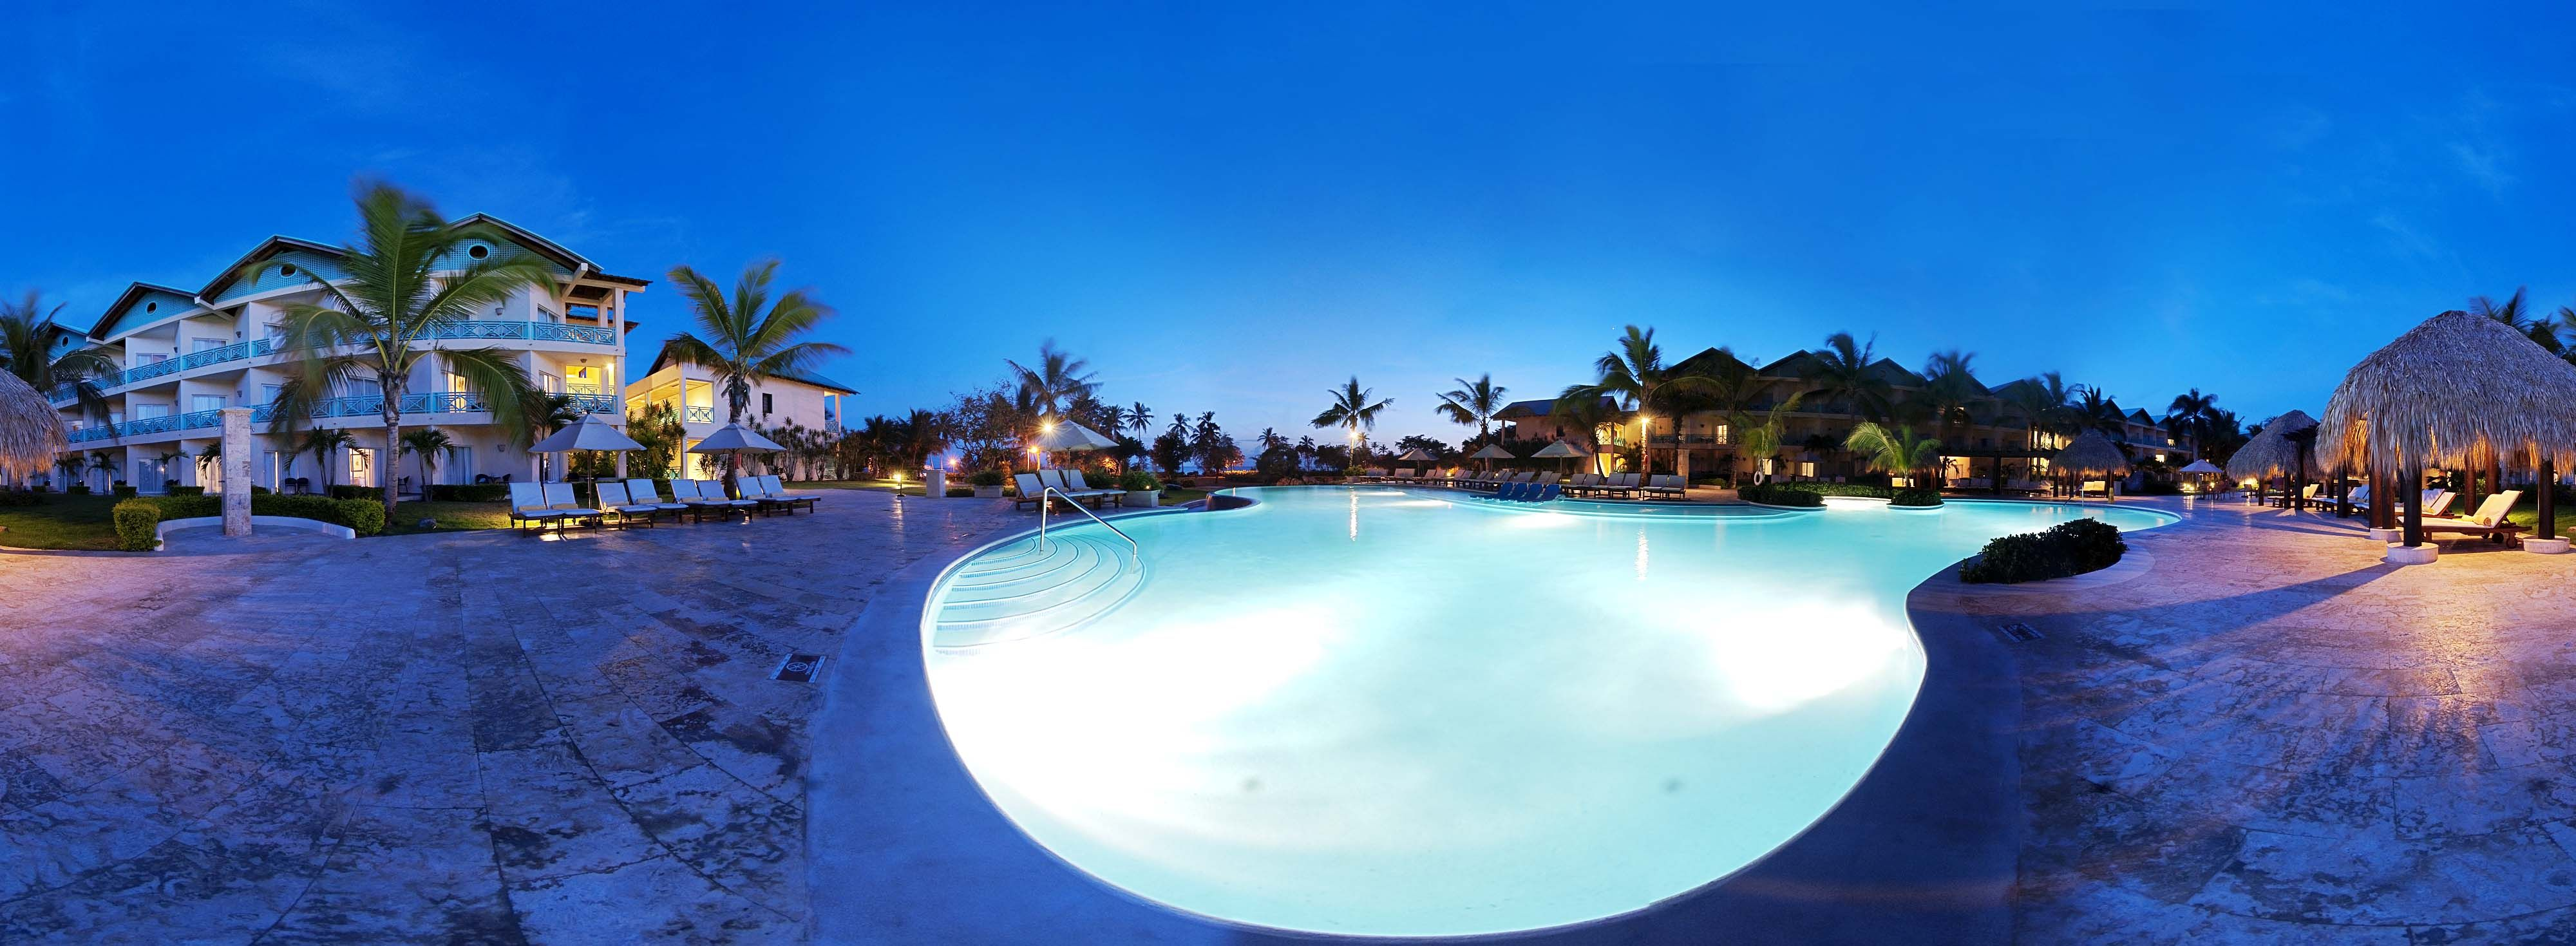 Preferred Club Pool Night 360 Vacation Resorts Dreams La Romana Vacation